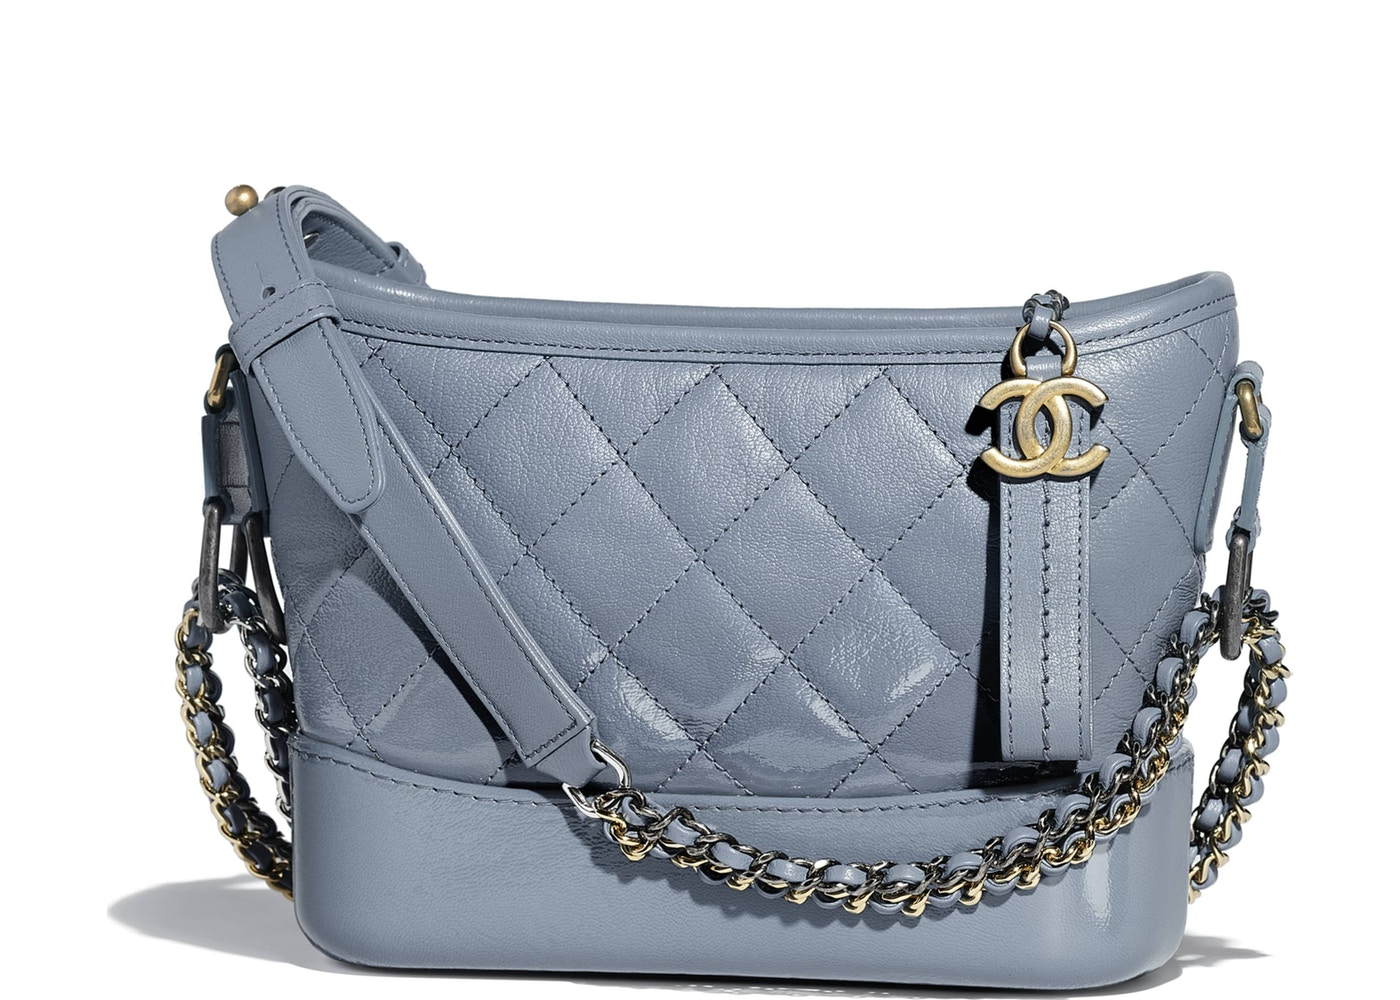 Chanel Gabrielle Hobo Bag Small Blue. Small Blue 6731590e55